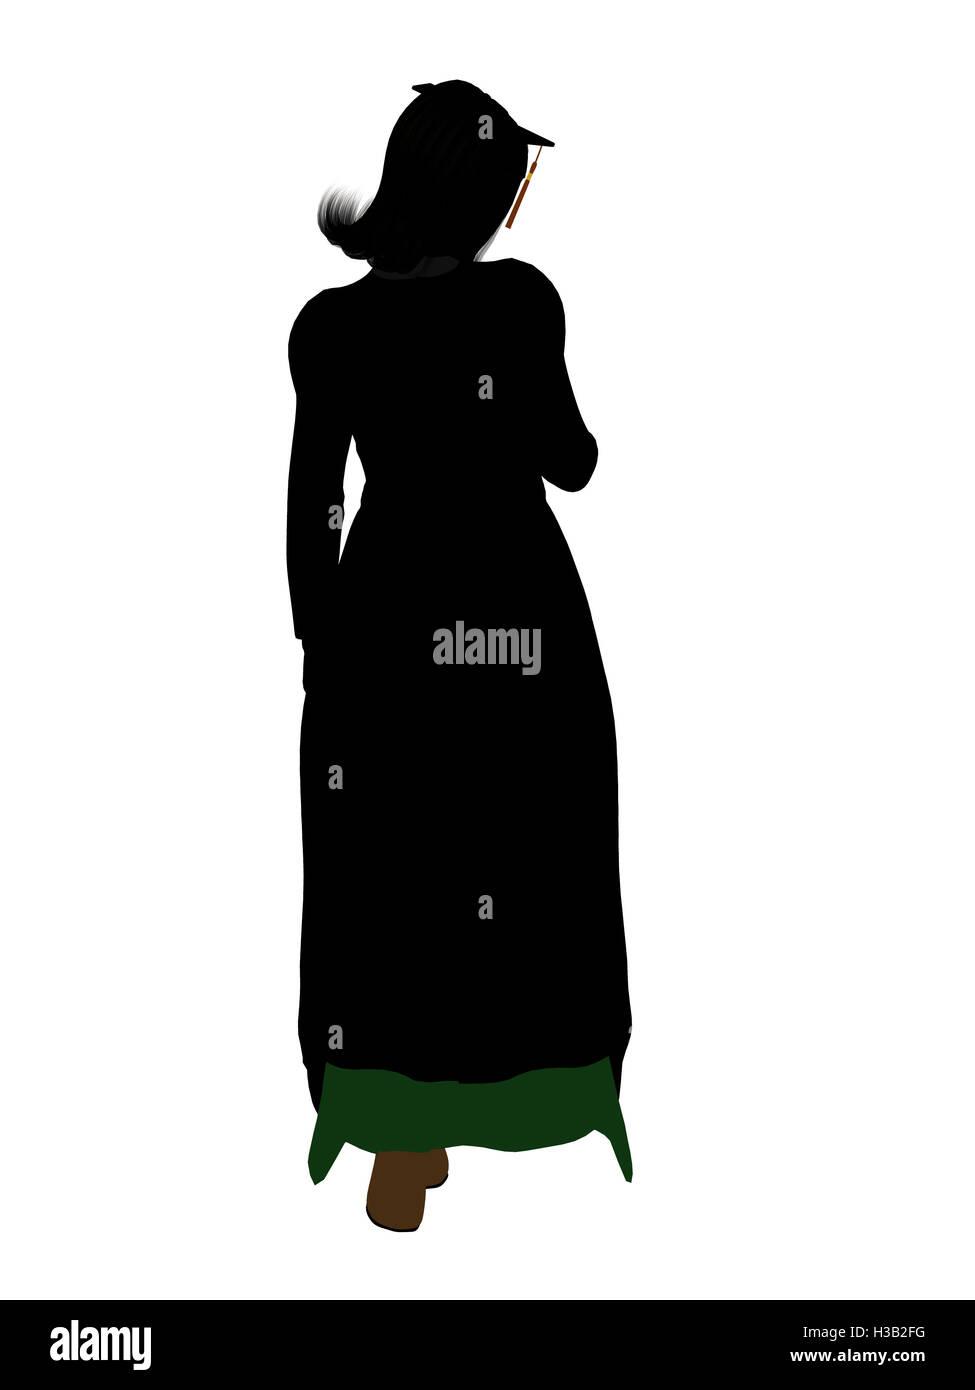 Graduate Illustration Silhouette - Stock Image